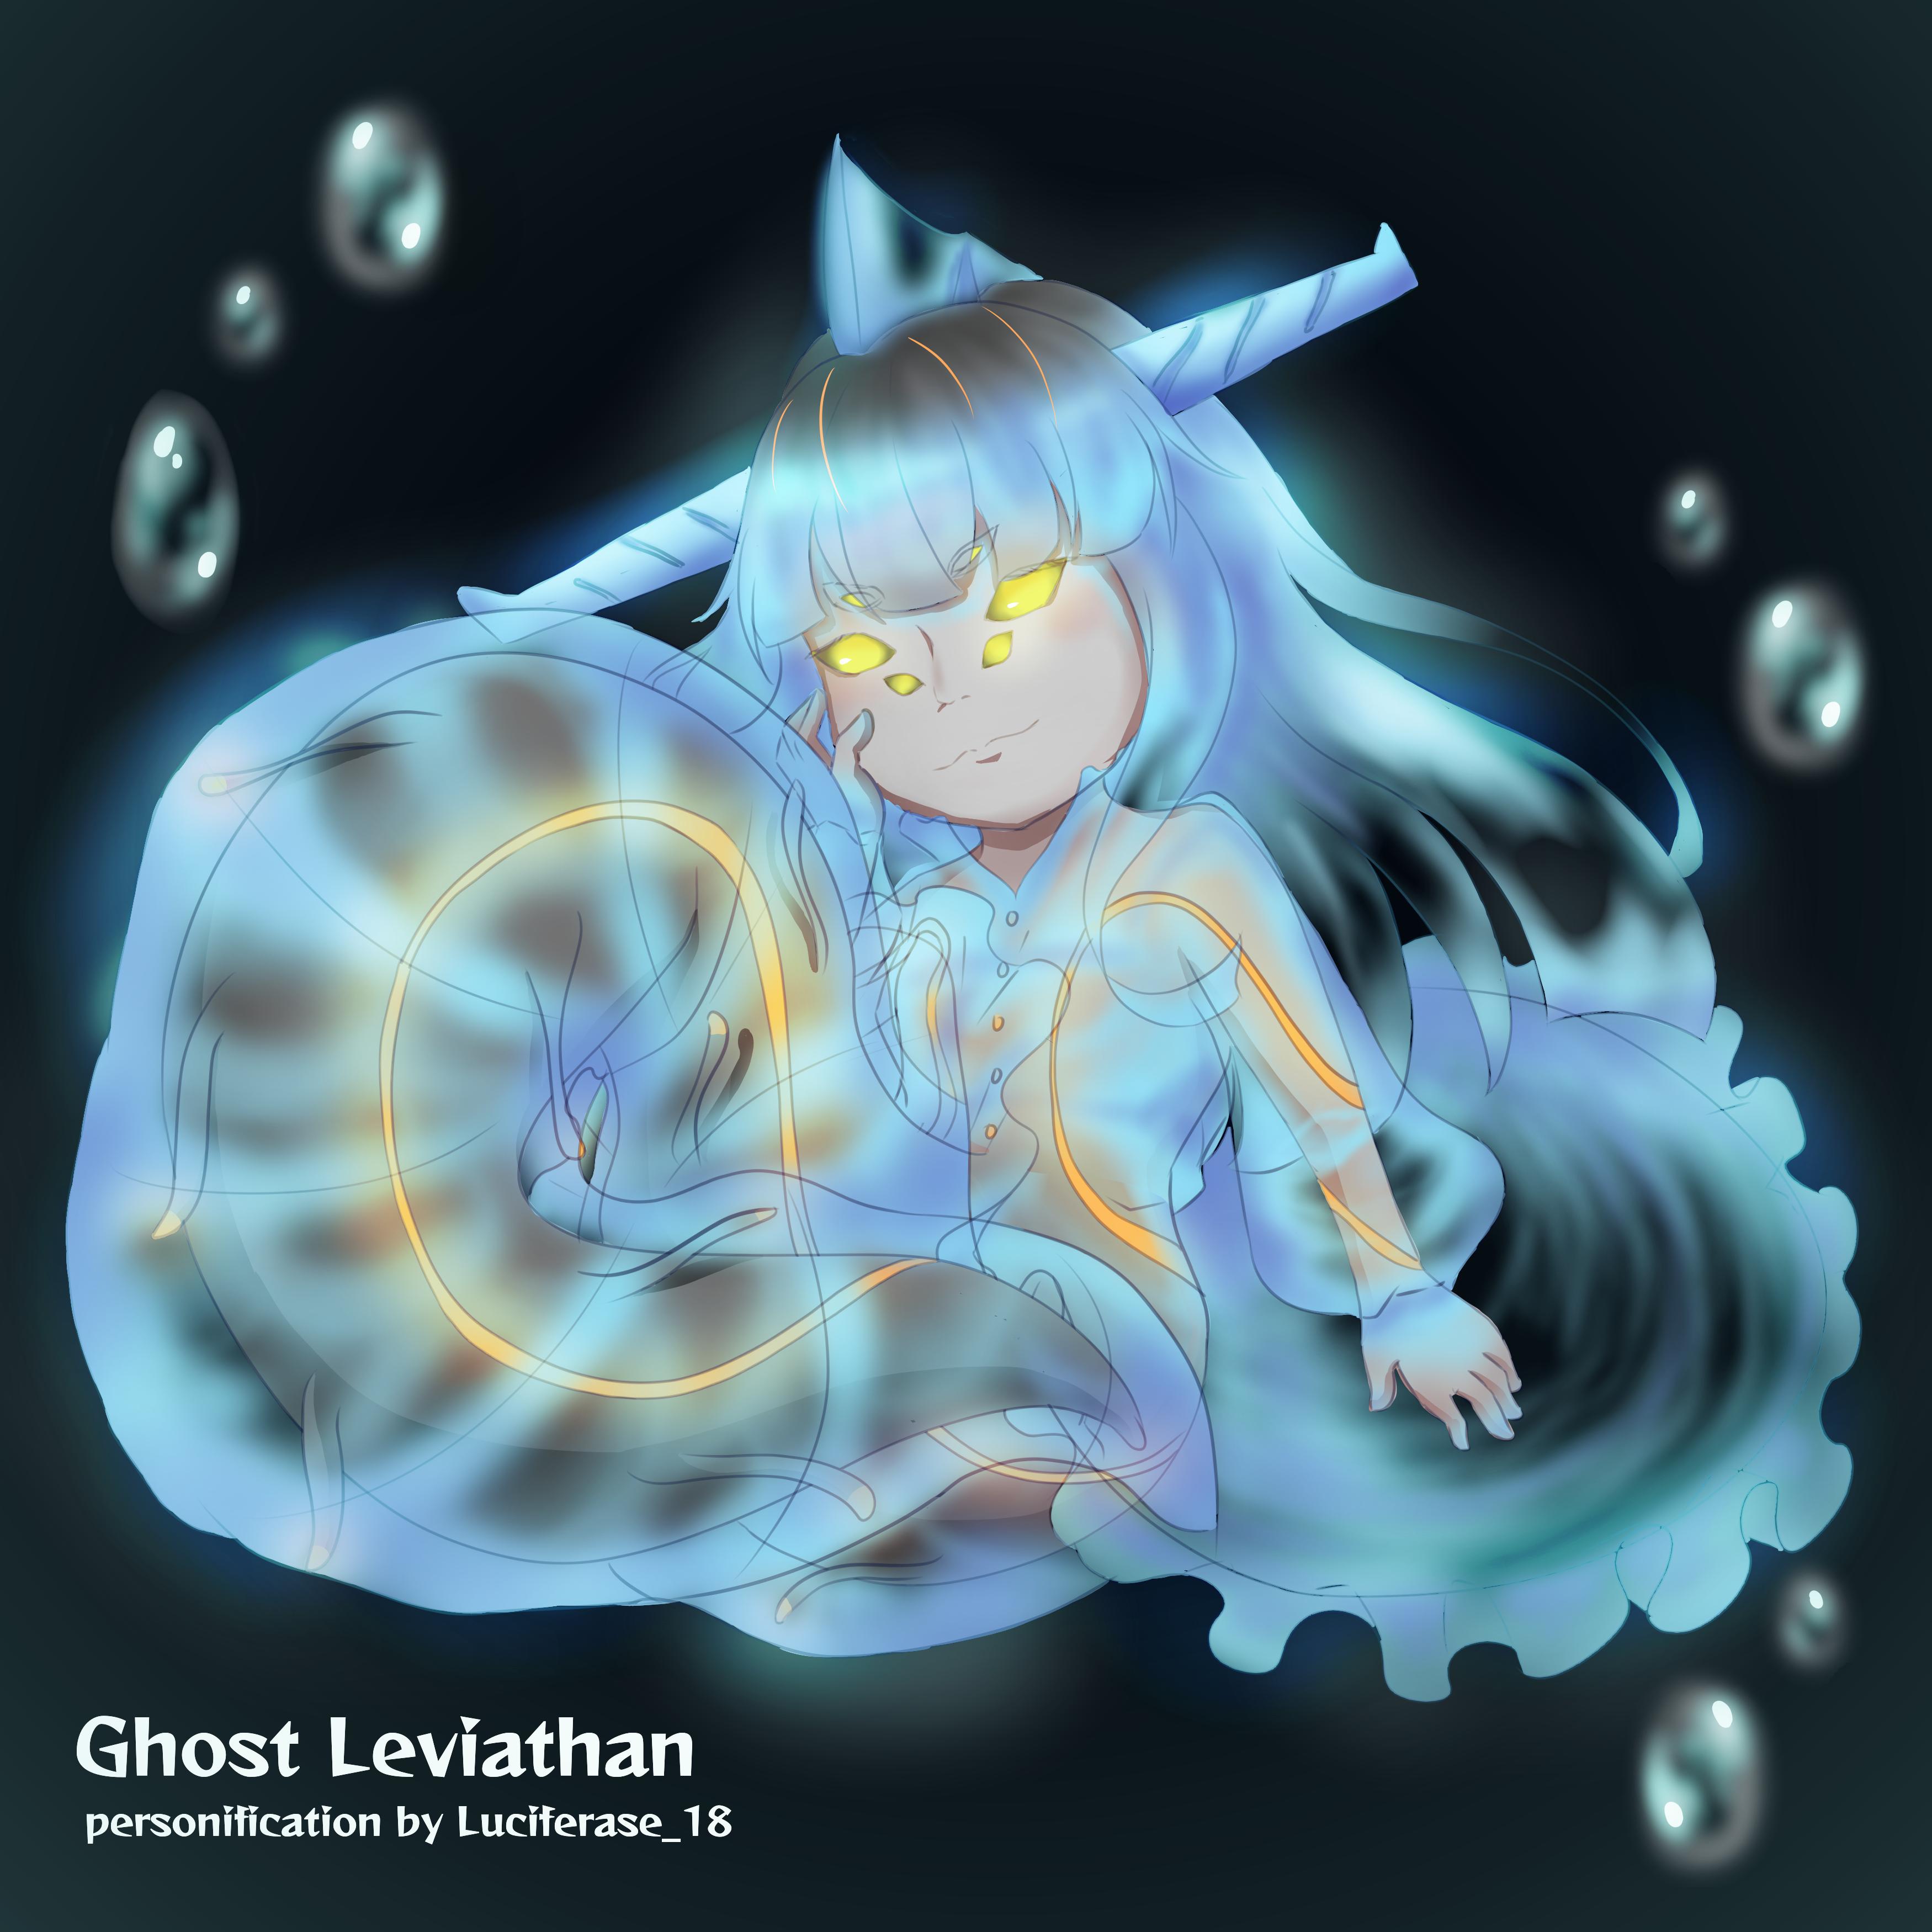 Subnautica] Ghost Leviathan chibi by DebiruHaato on DeviantArt